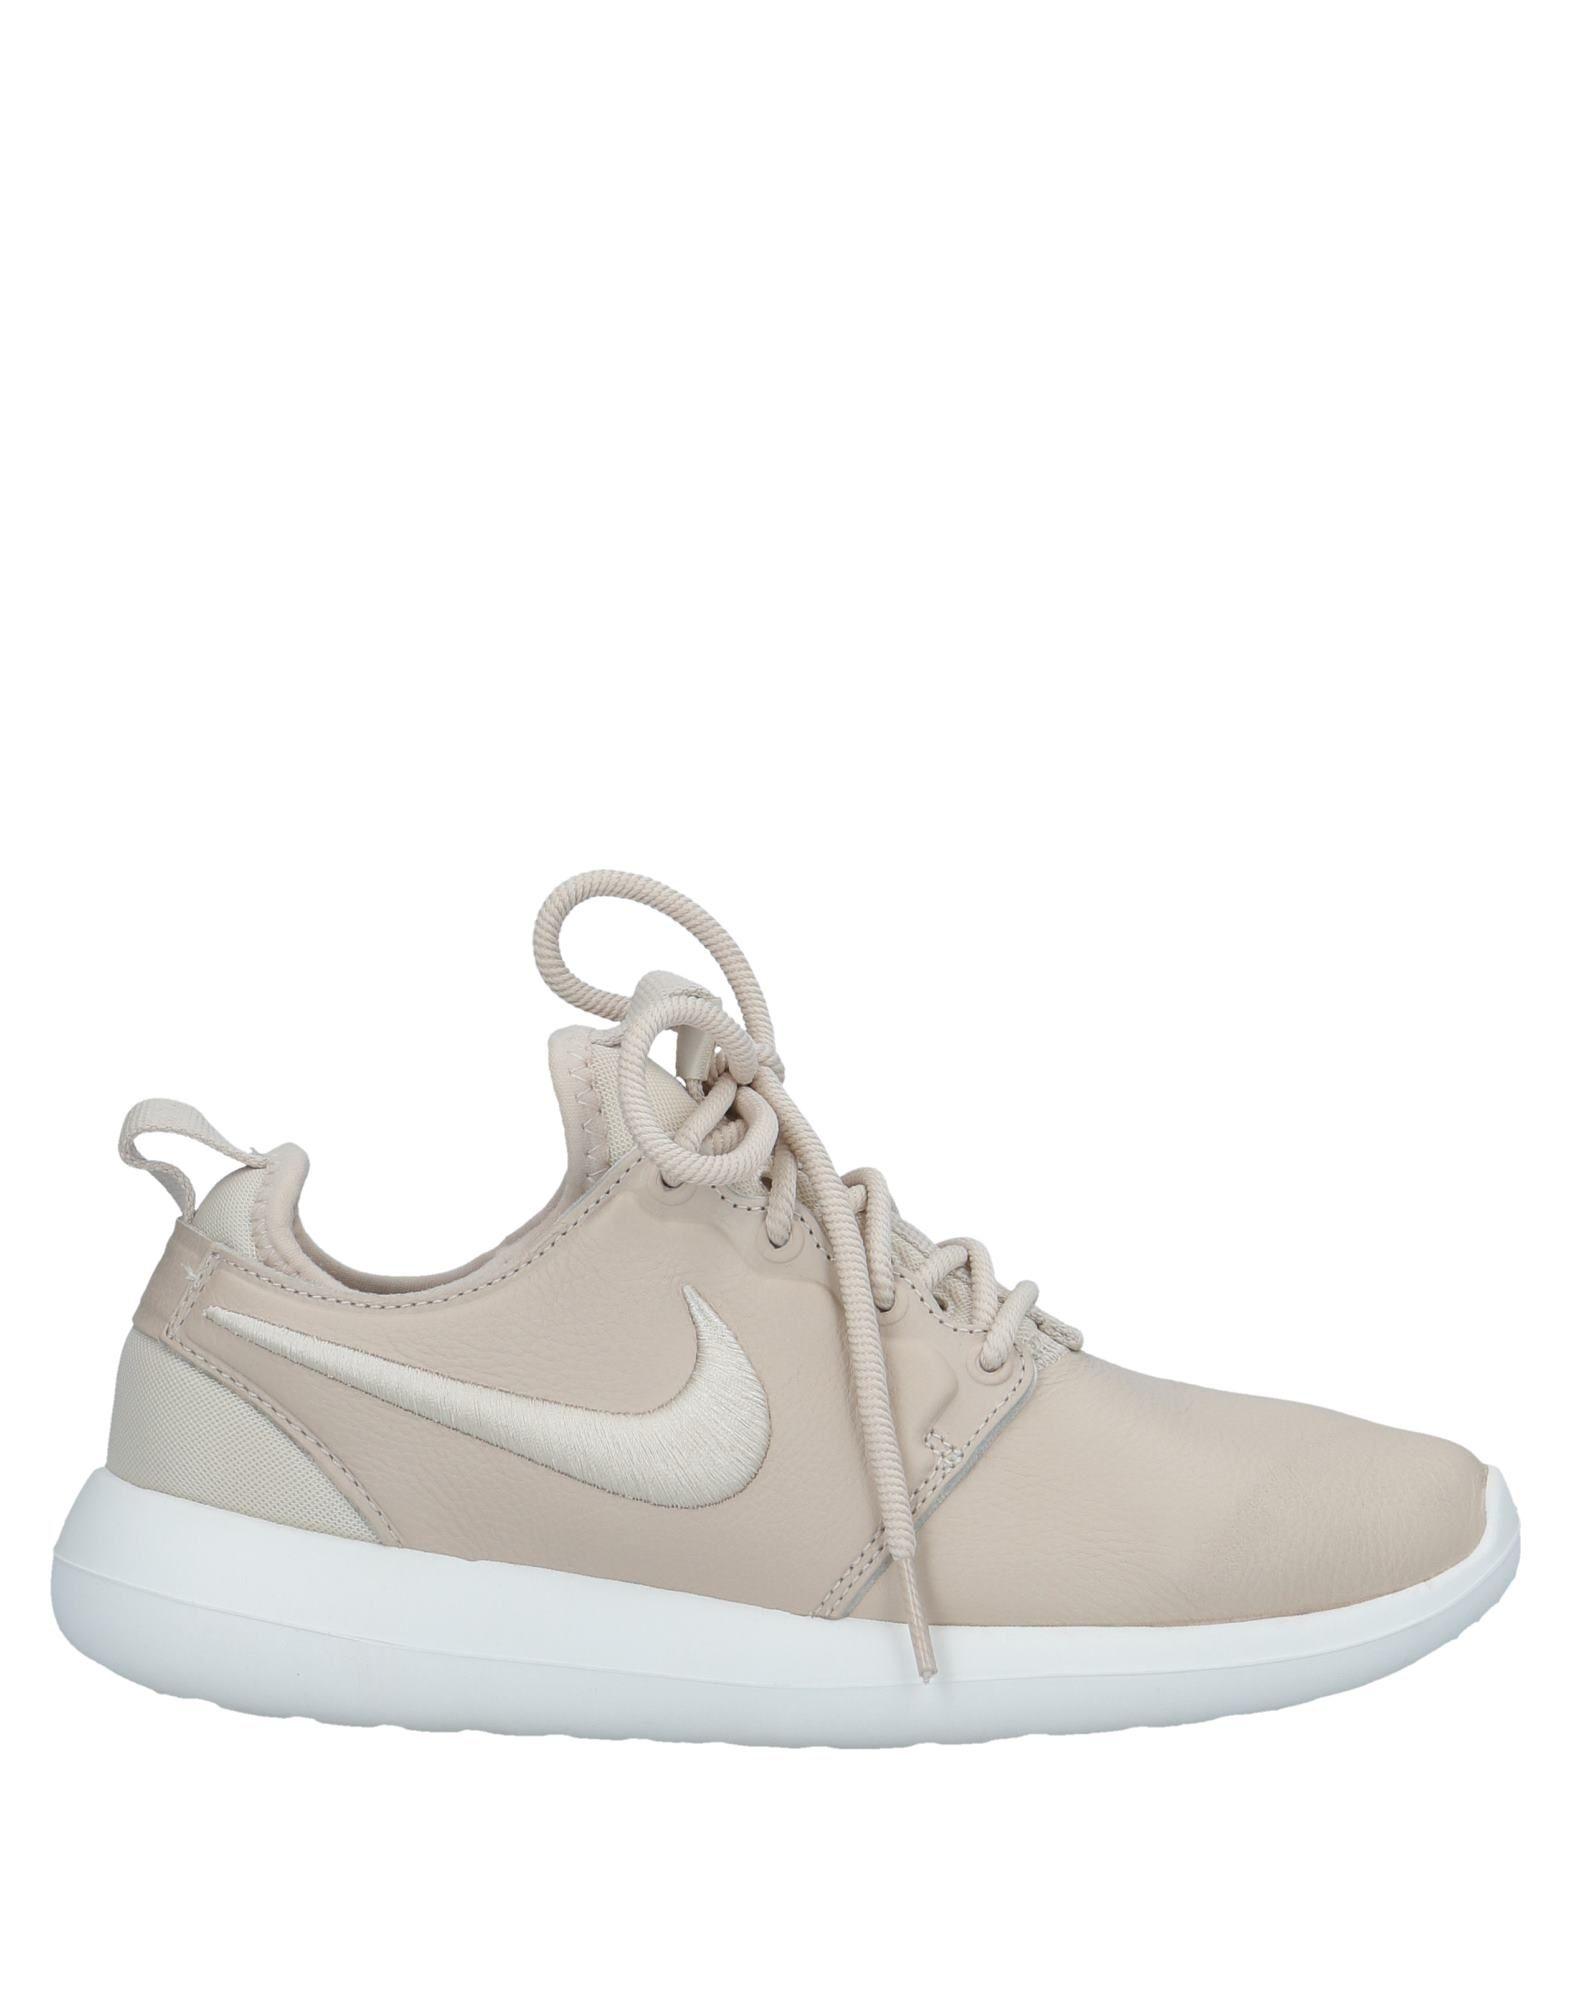 Baskets Nike Femme - Baskets Nike Beige Remise de marque